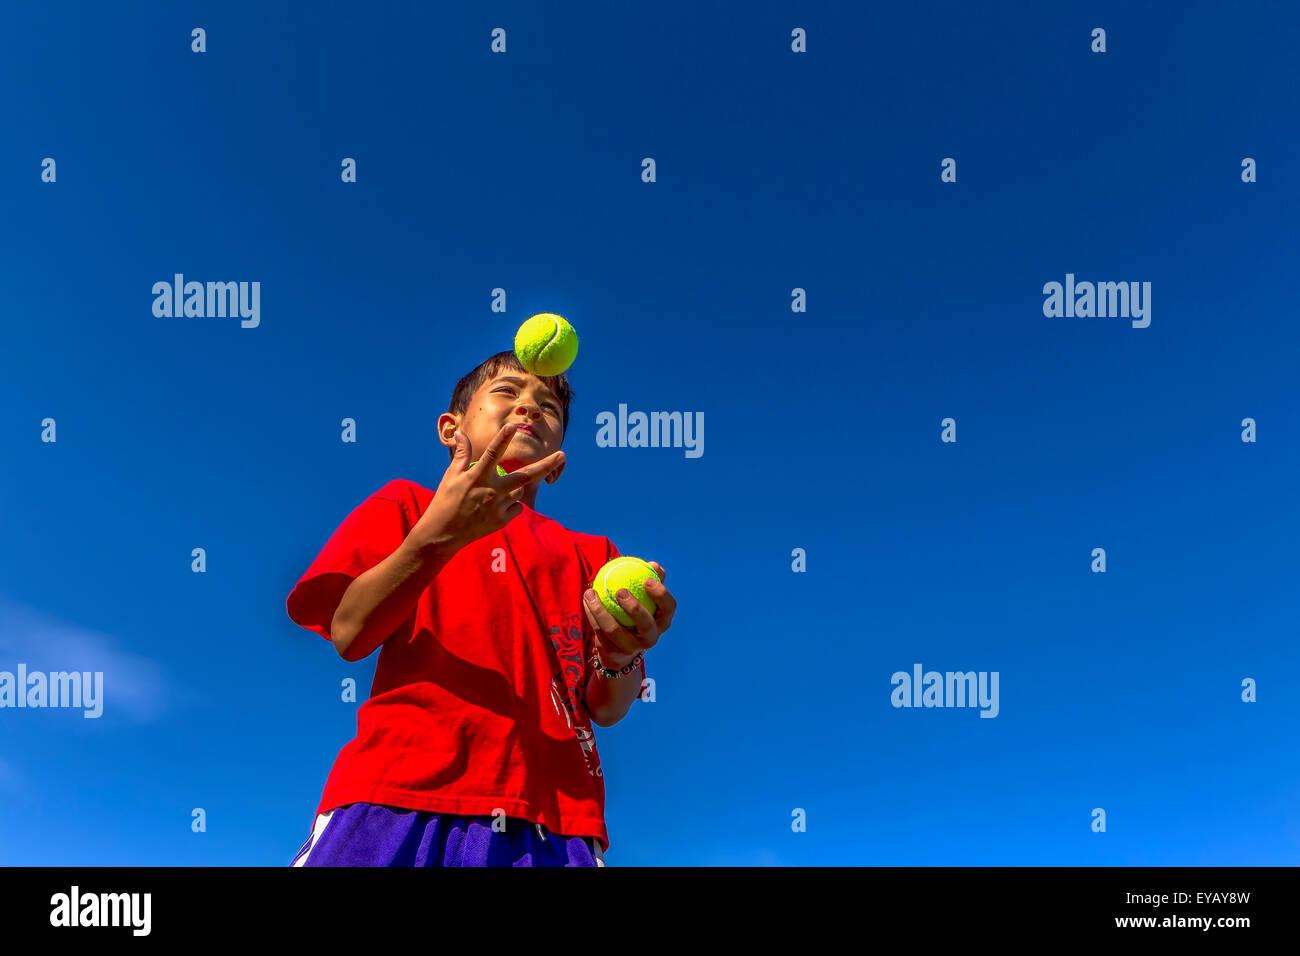 Starting to juggle. - Stock Image